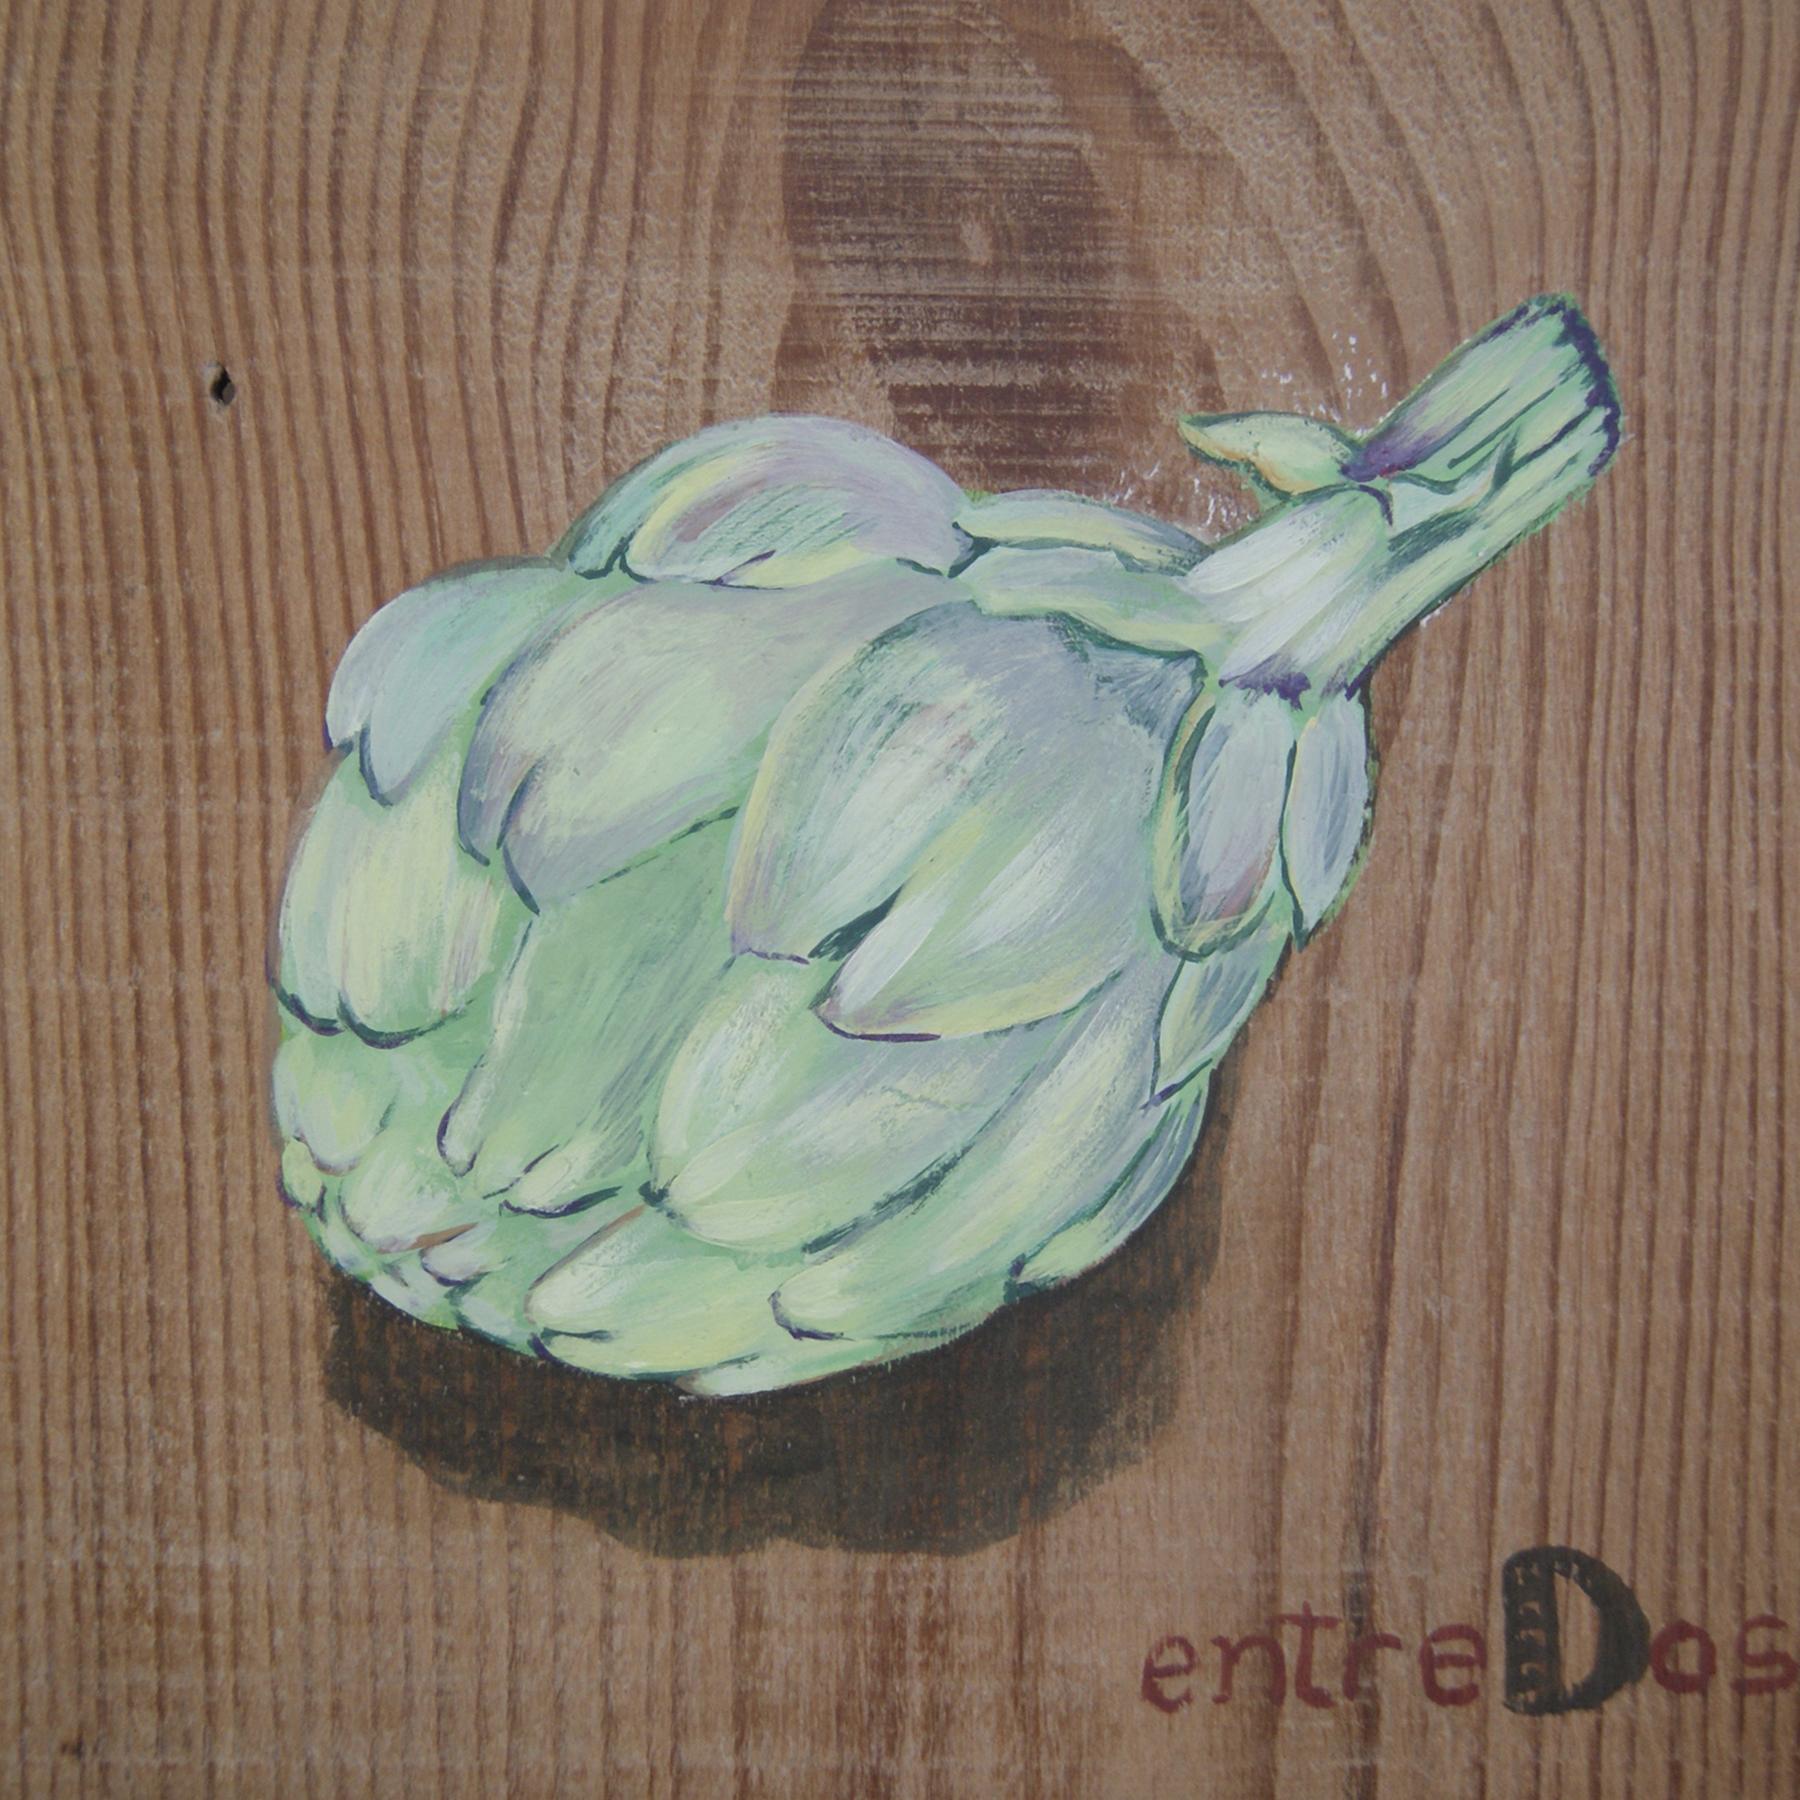 Pintura decorativa alcachofa muebles madera verduras